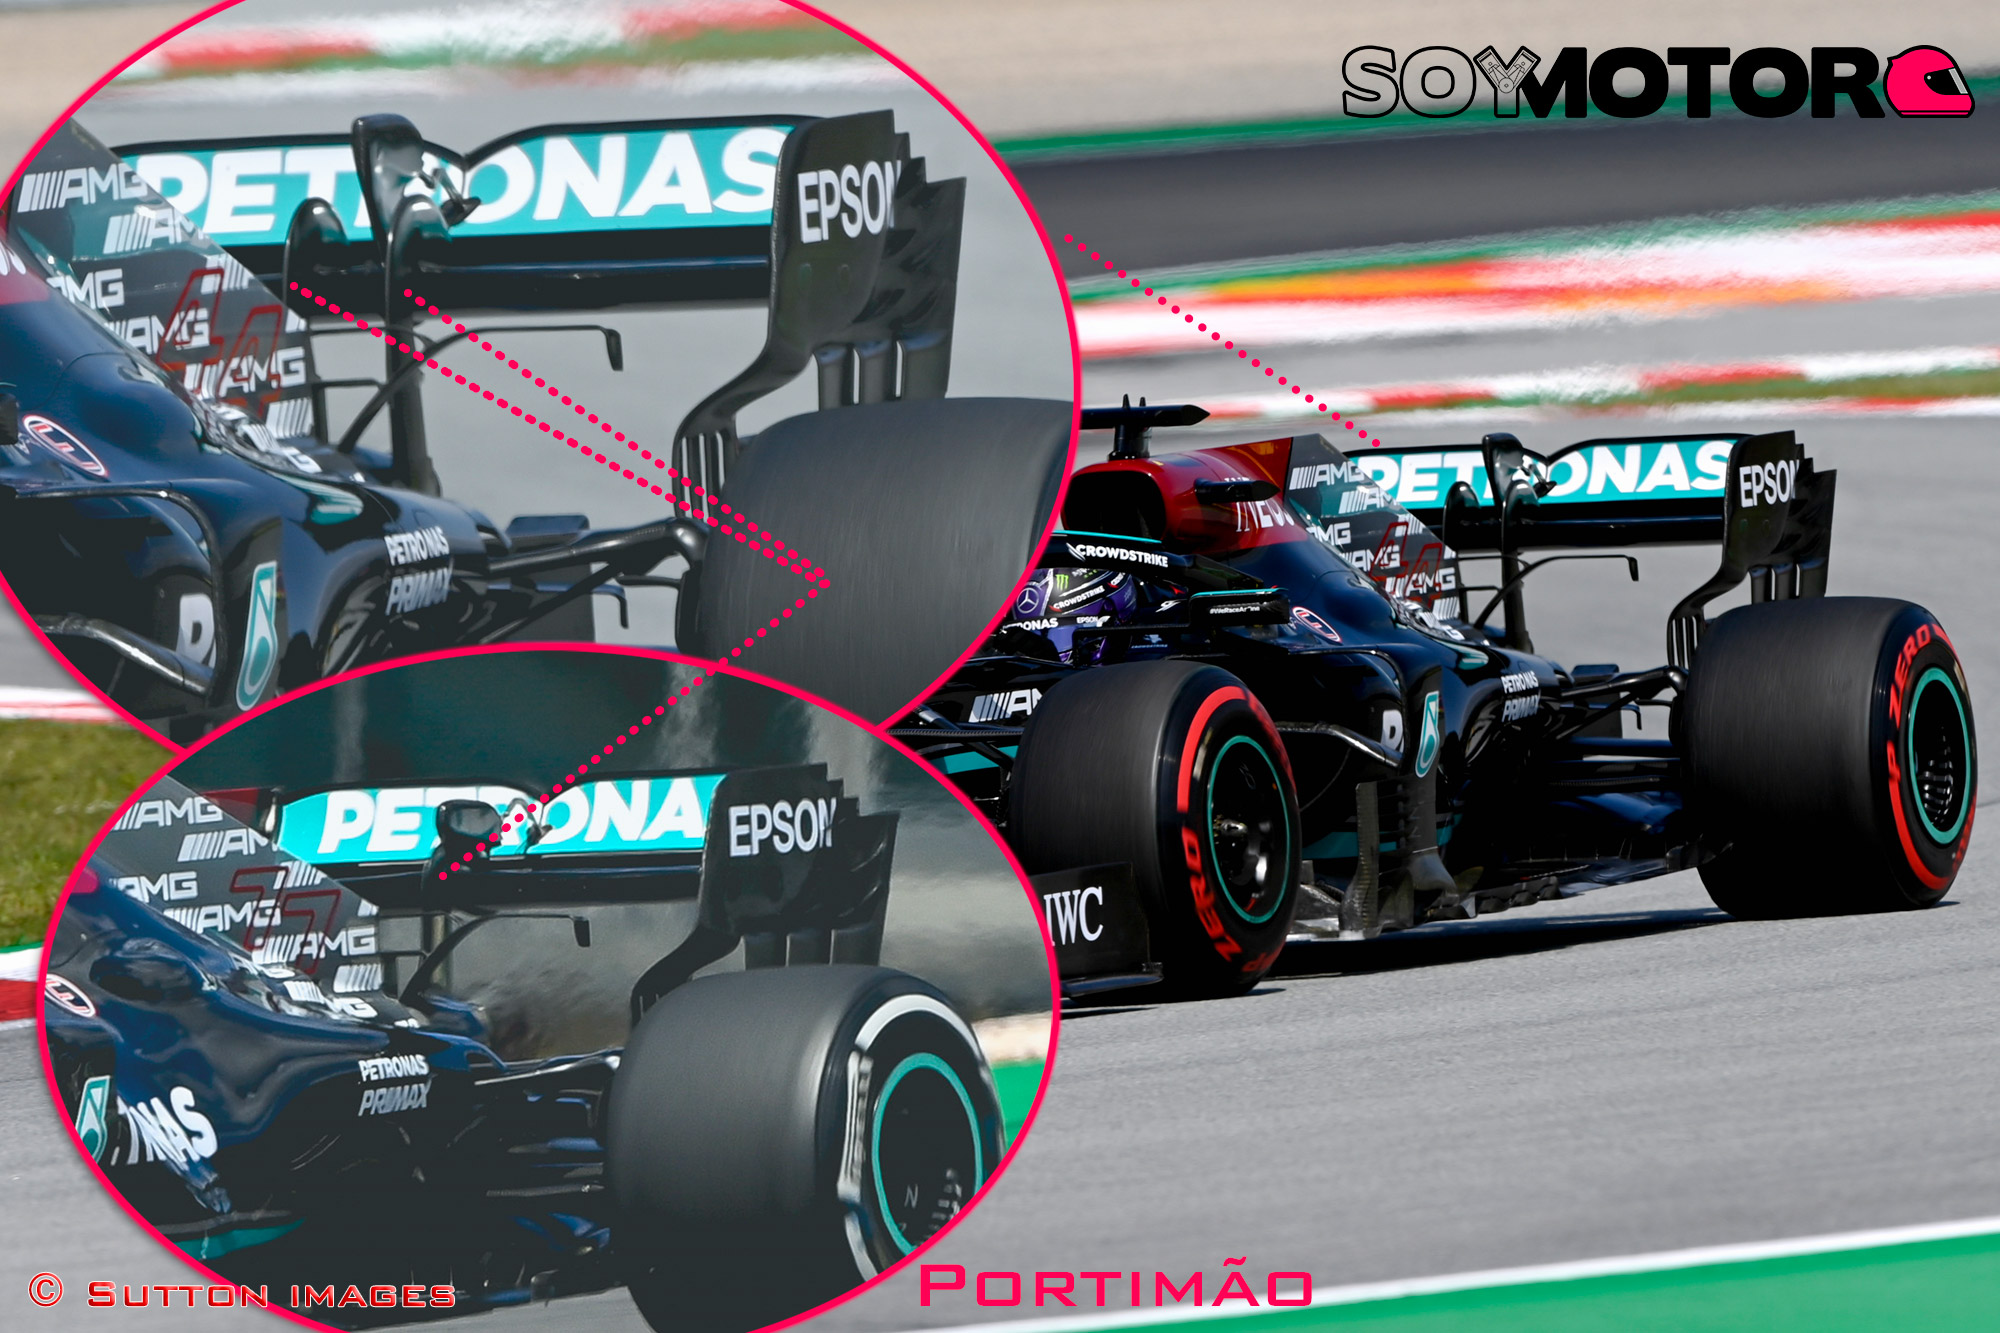 mercedes-ala-trasera-soymotor_5.jpg